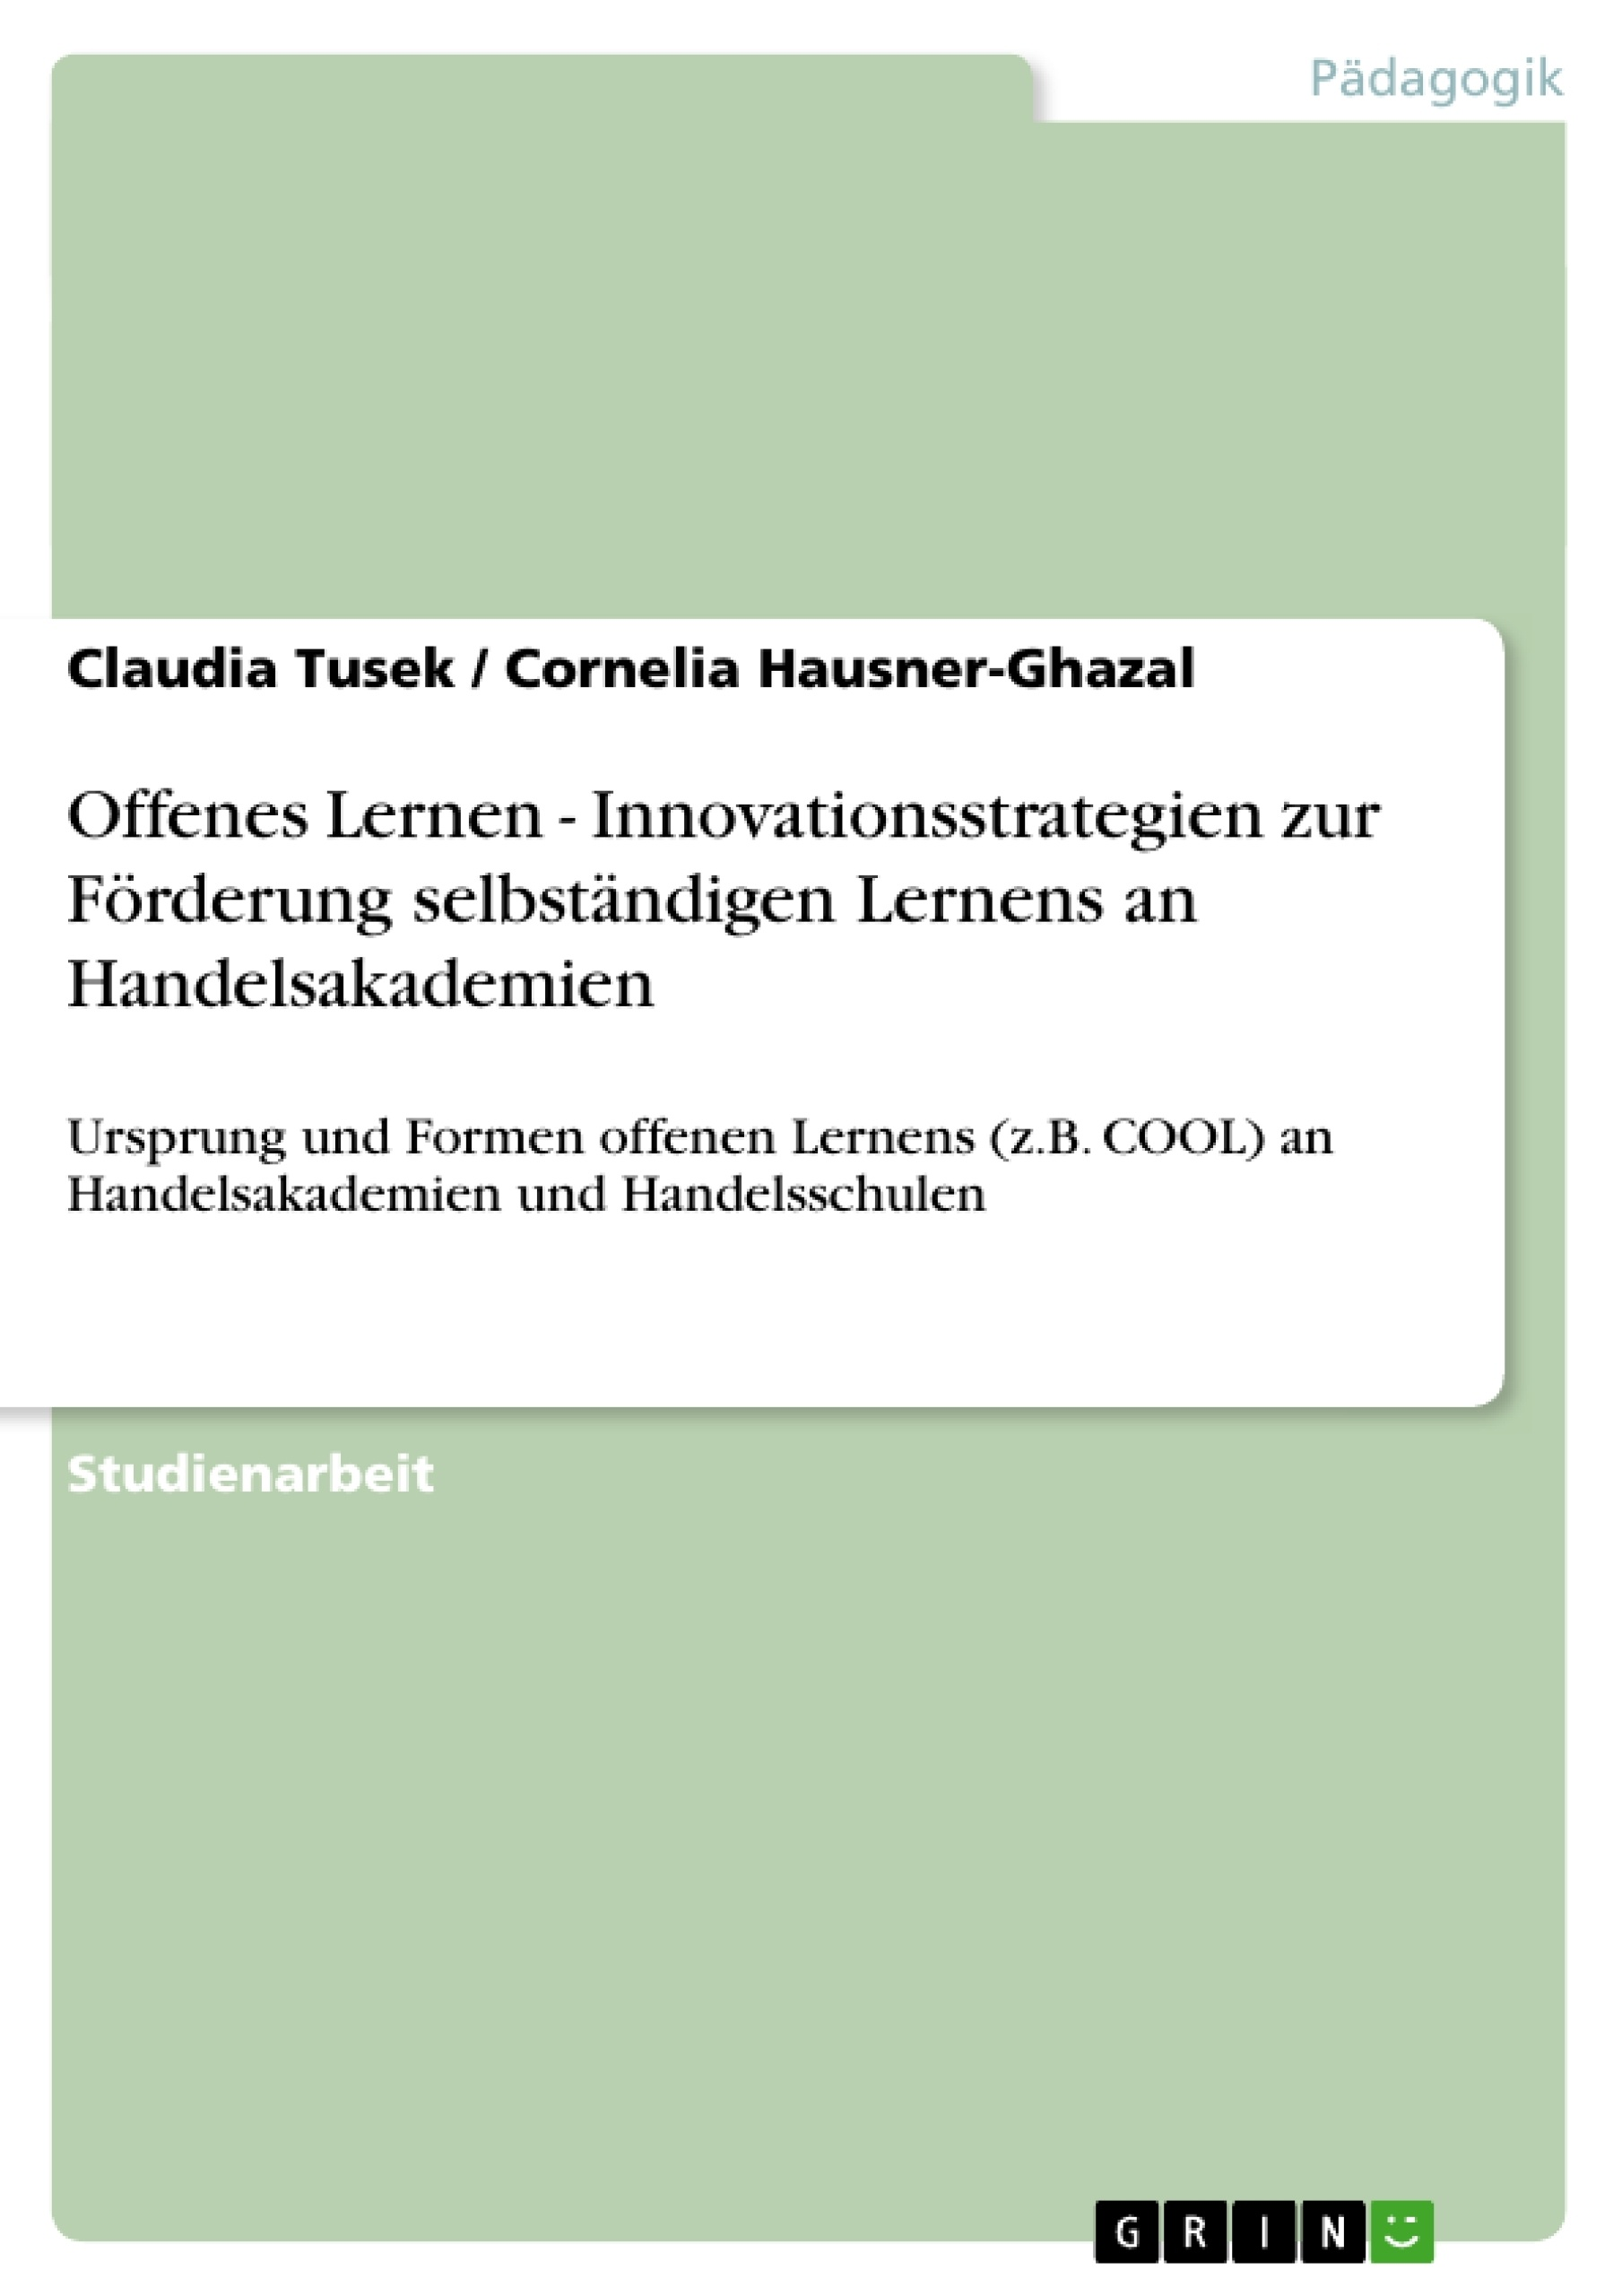 Titel: Offenes Lernen - Innovationsstrategien zur Förderung selbständigen Lernens an Handelsakademien